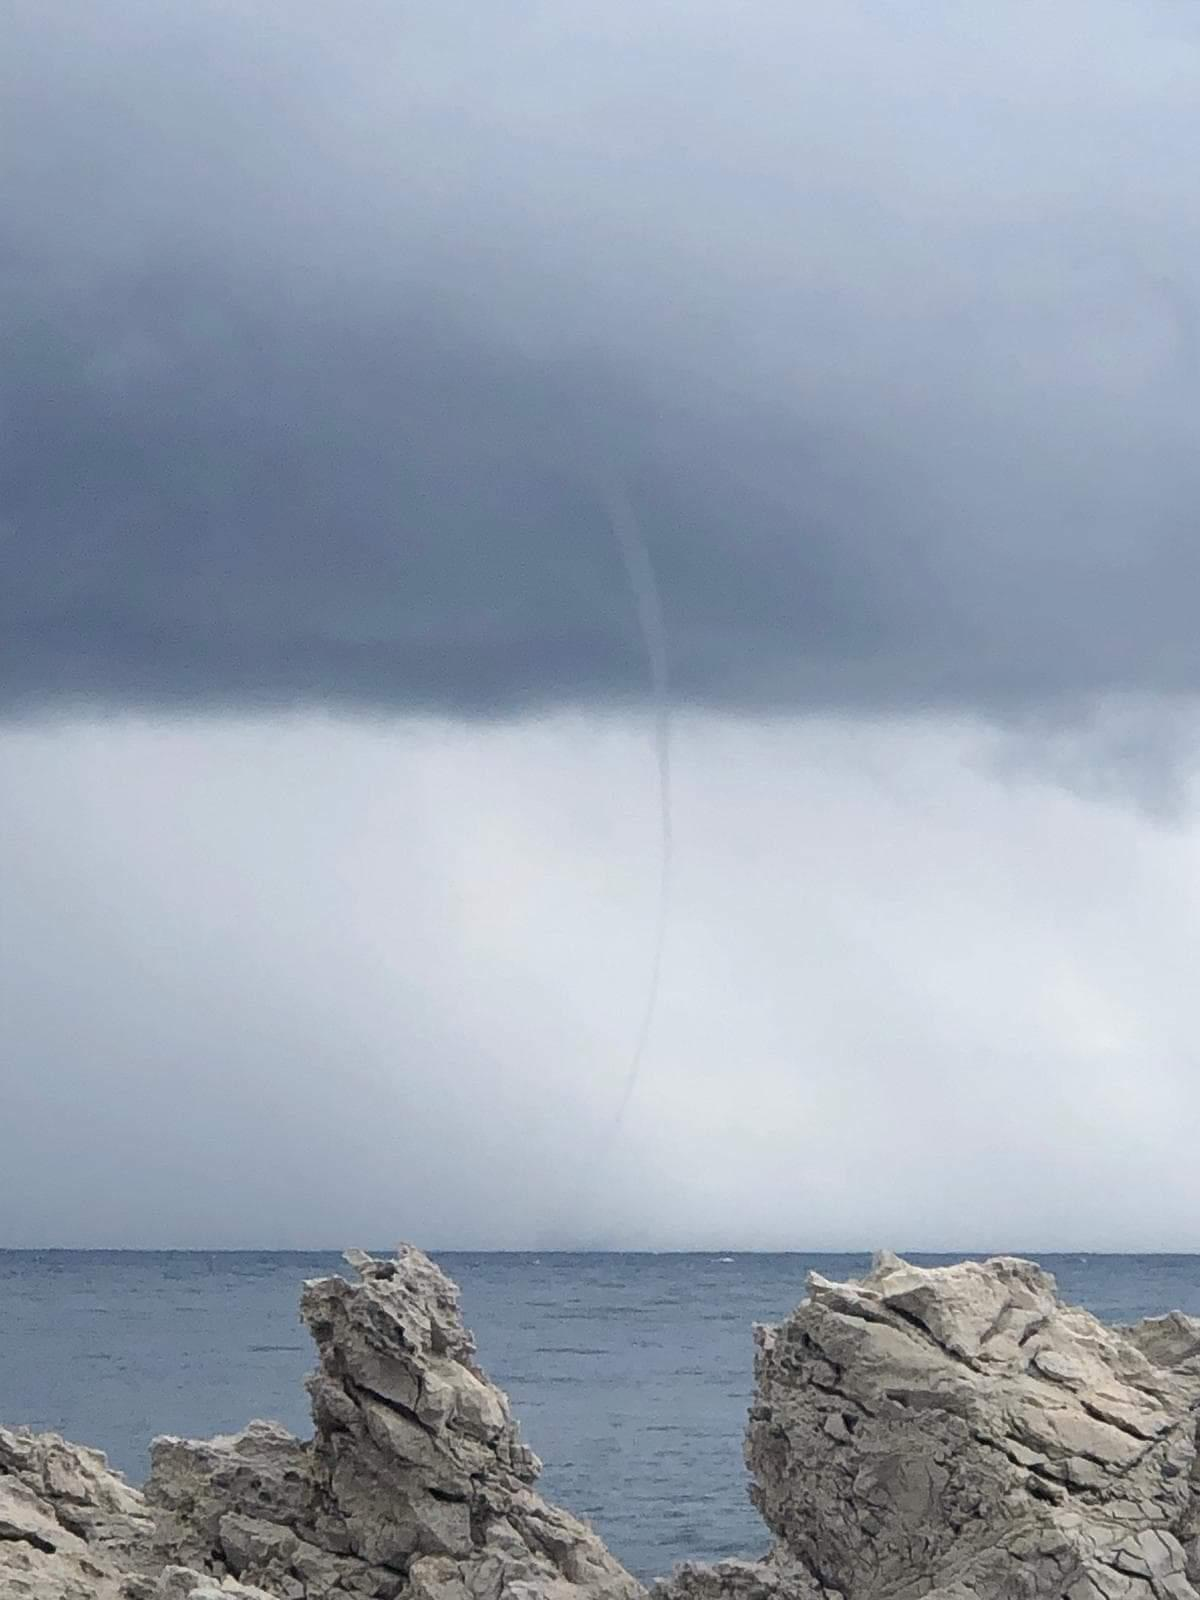 La trombe marine observée depuis le Cap d'Antibes.